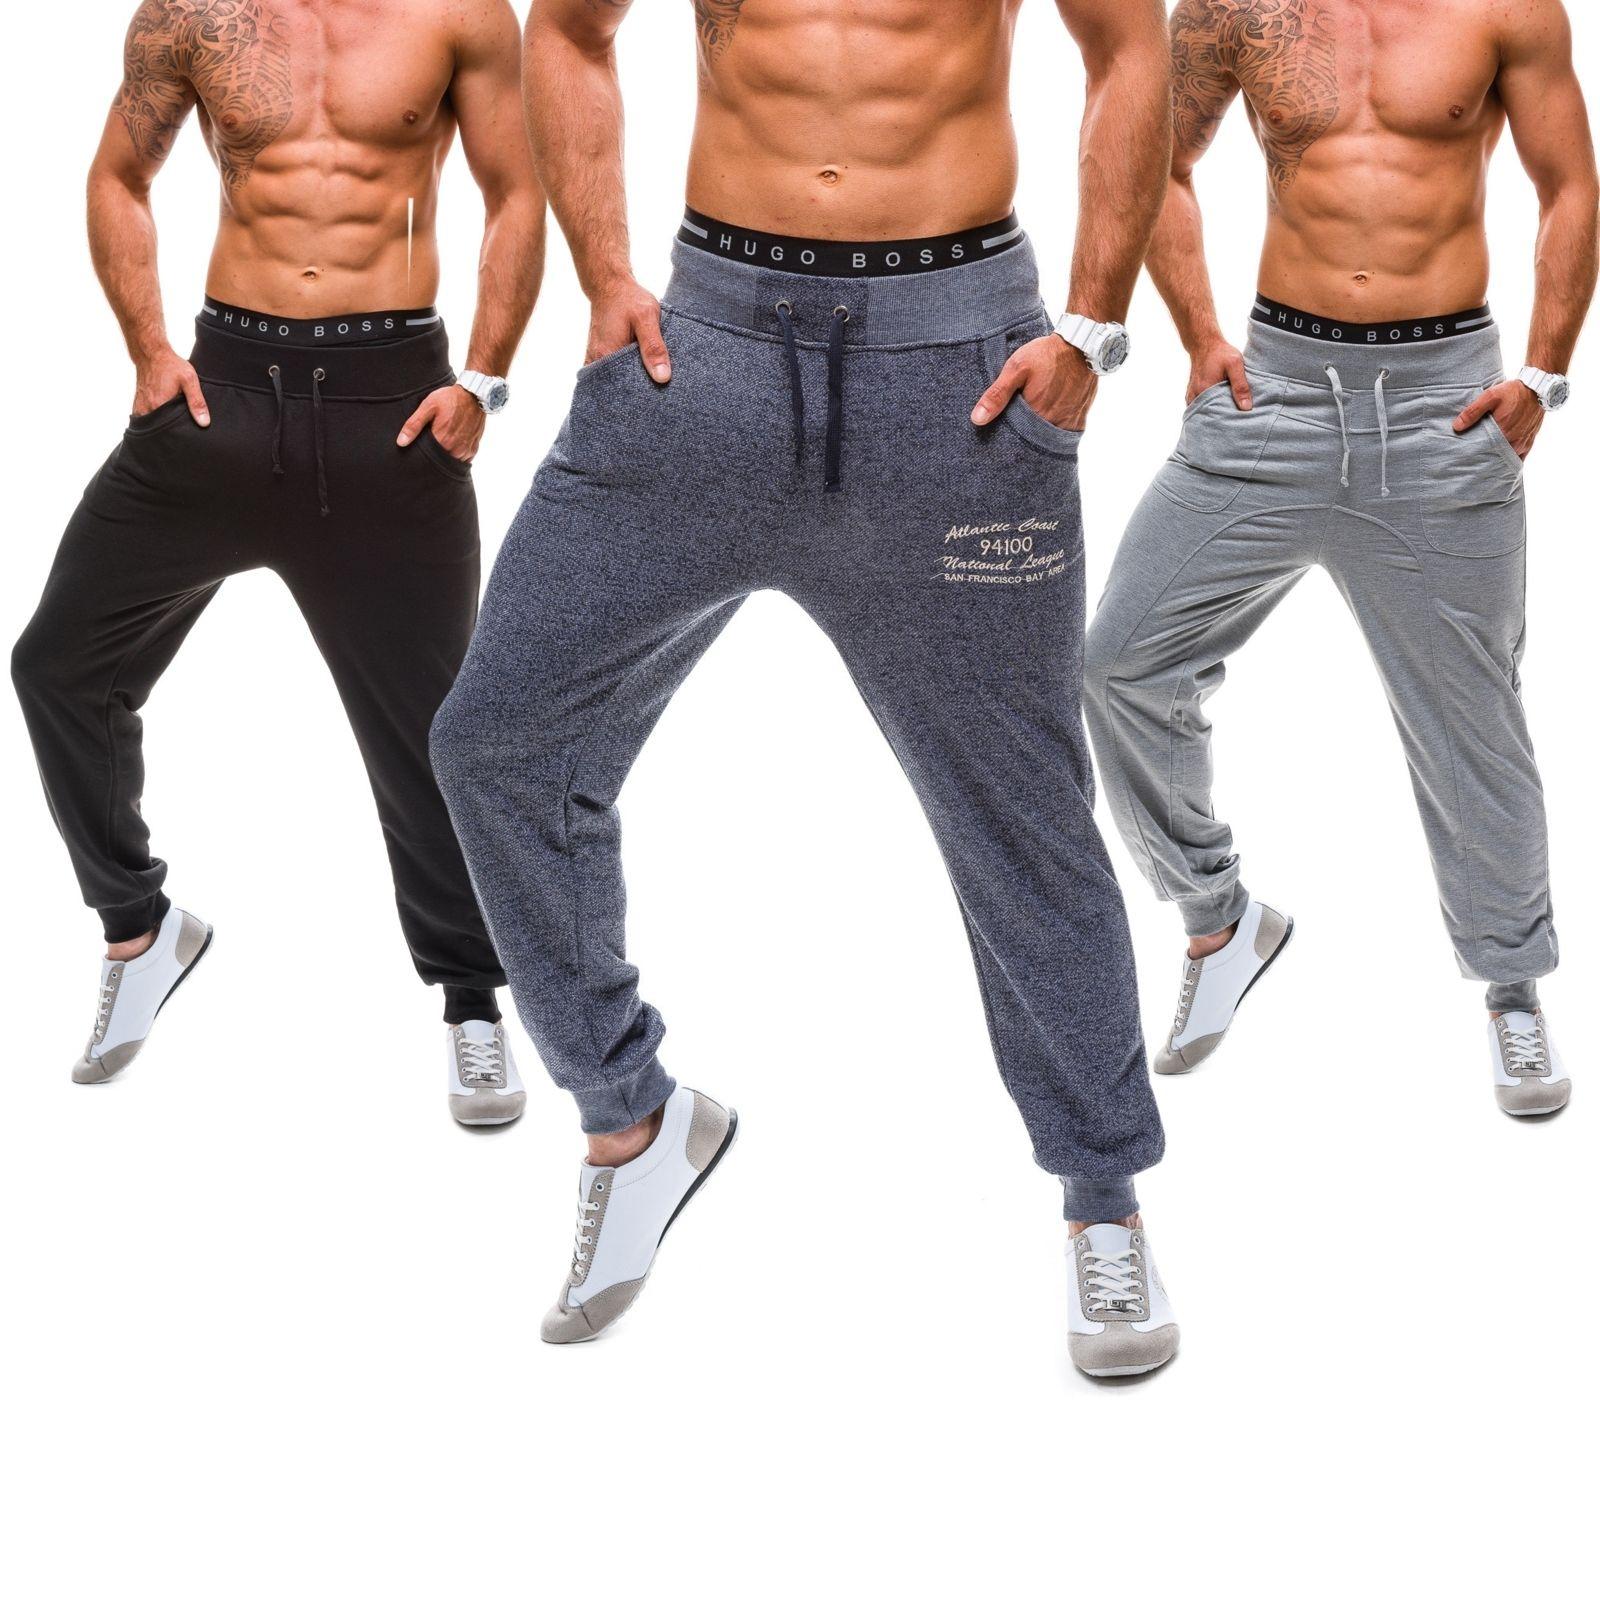 BOLF BBG Herren Sporthose Baggy Trainingshose Jogging Fitness MIX 6F6 Farbwahl